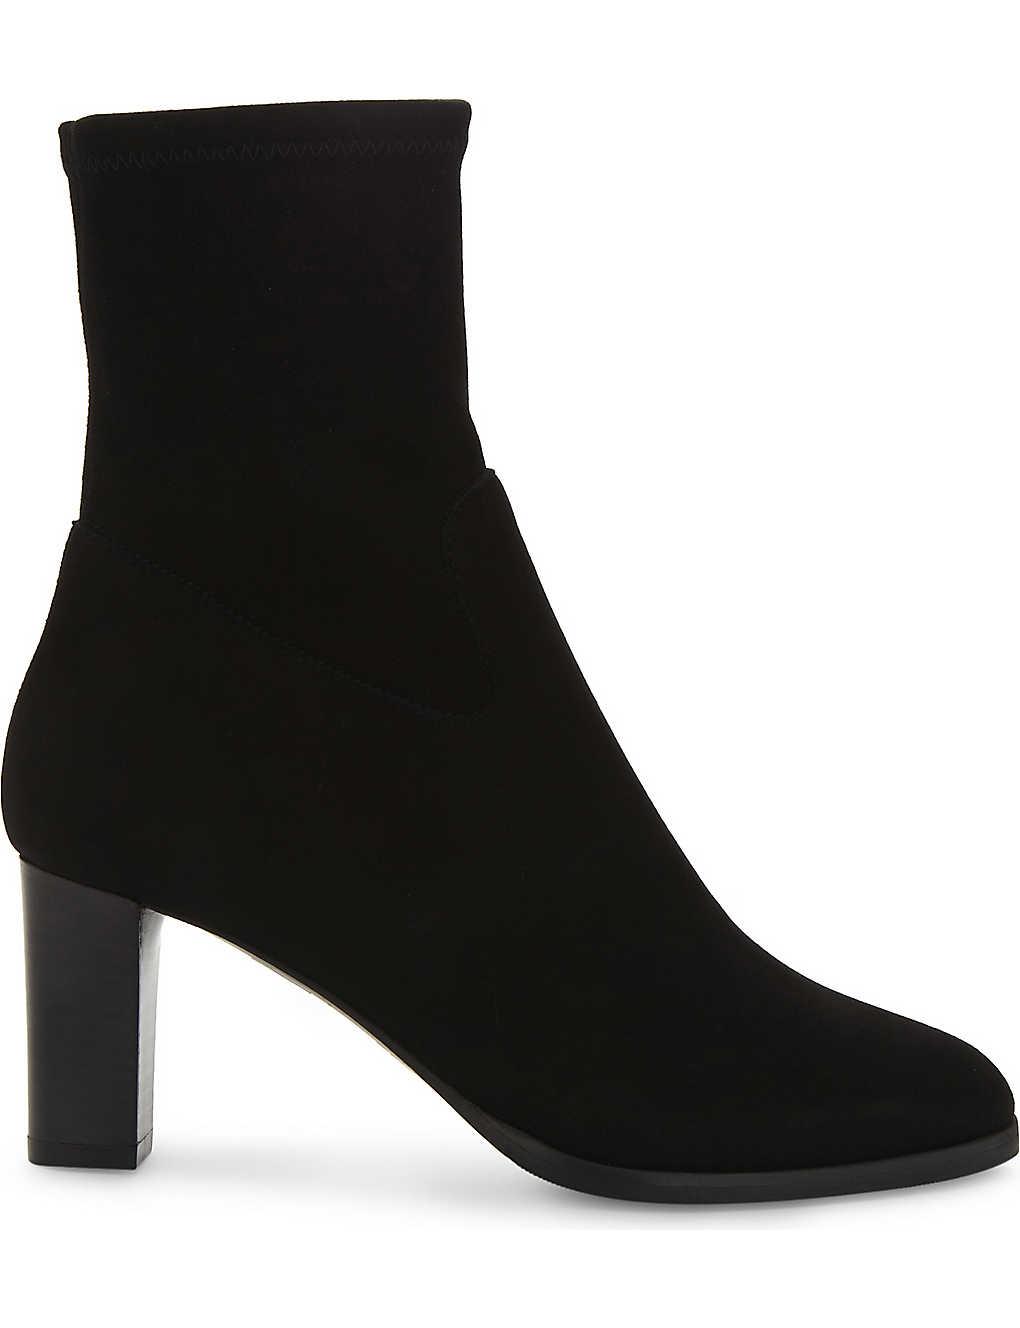 e5245e2c2 LK BENNETT - Kayla stretch-suede ankle boots | Selfridges.com